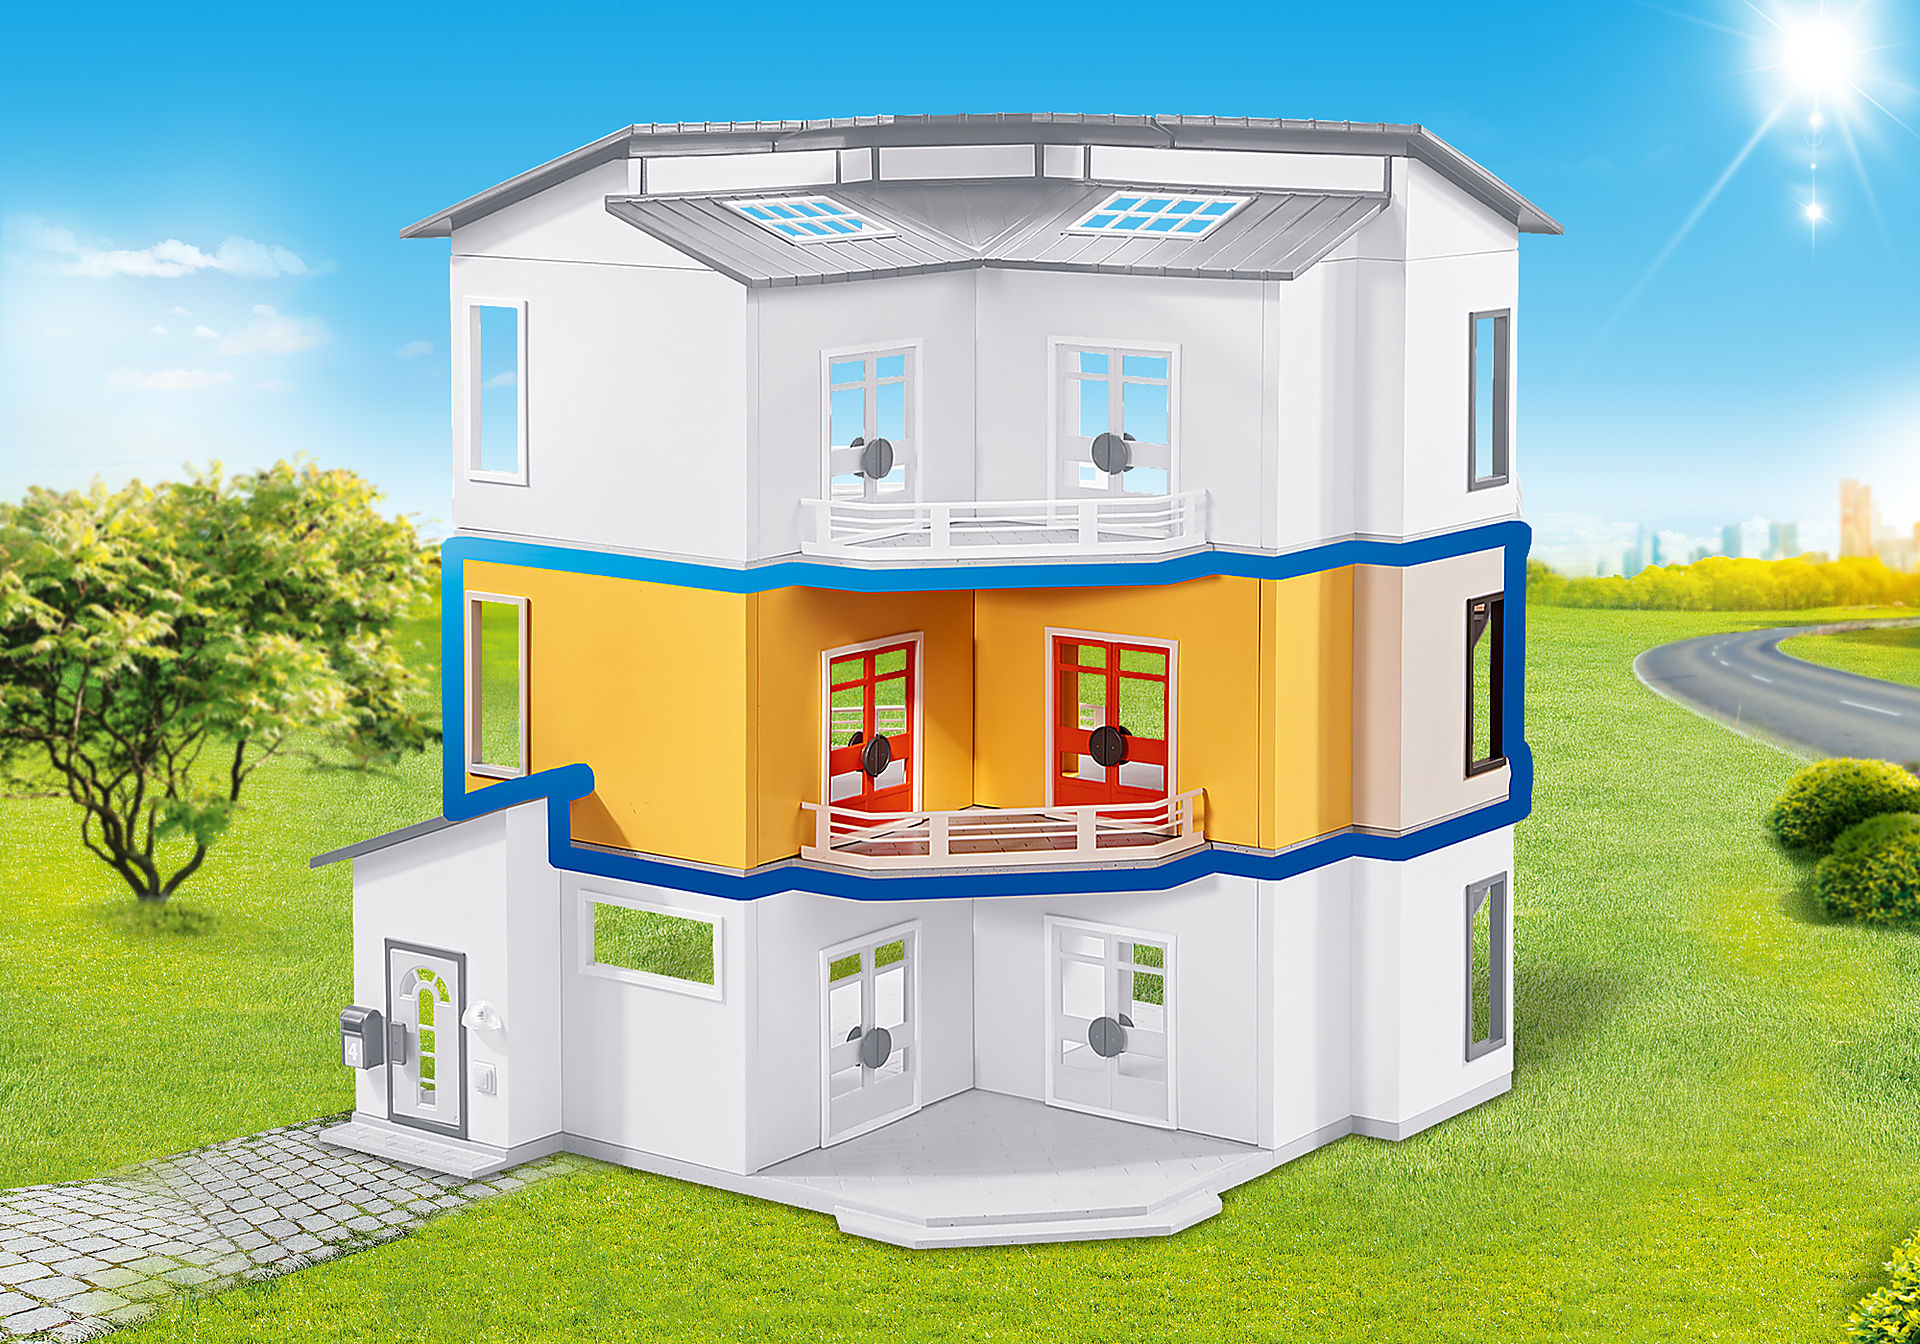 6554 Etagenergänzung Wohnhaus zoom image1